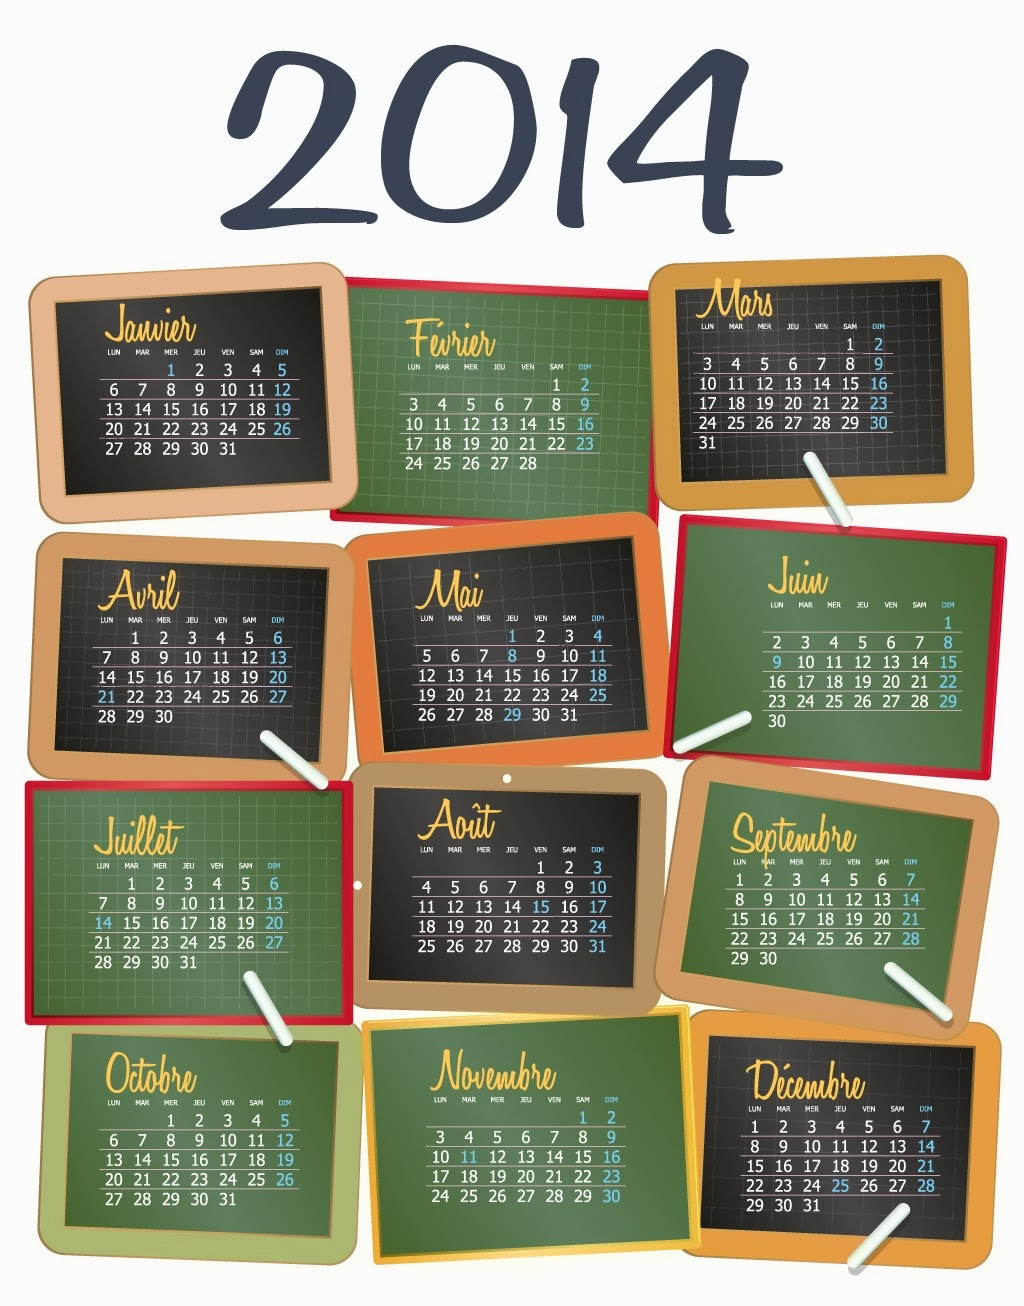 2014 monthly calendar desktop wallpaper - photo #39